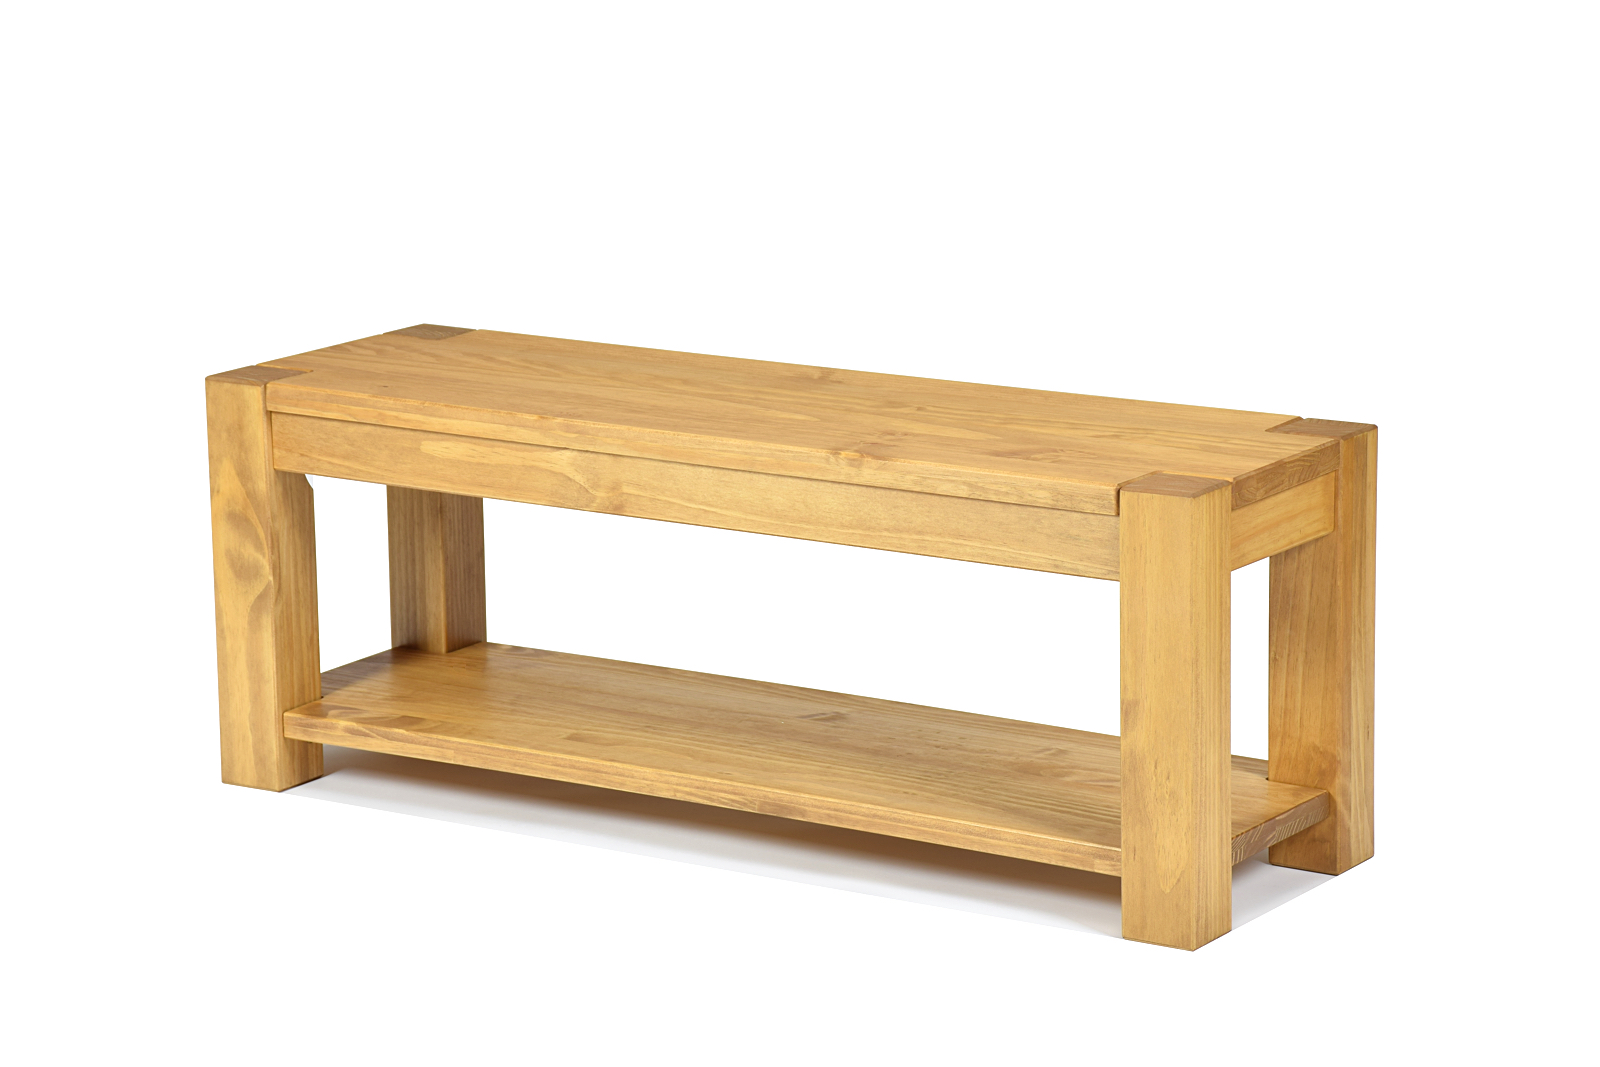 Sitzbank mit Ablageboden 120x38cm Honig hell Rio Bonito Massivholz Bank Pinie